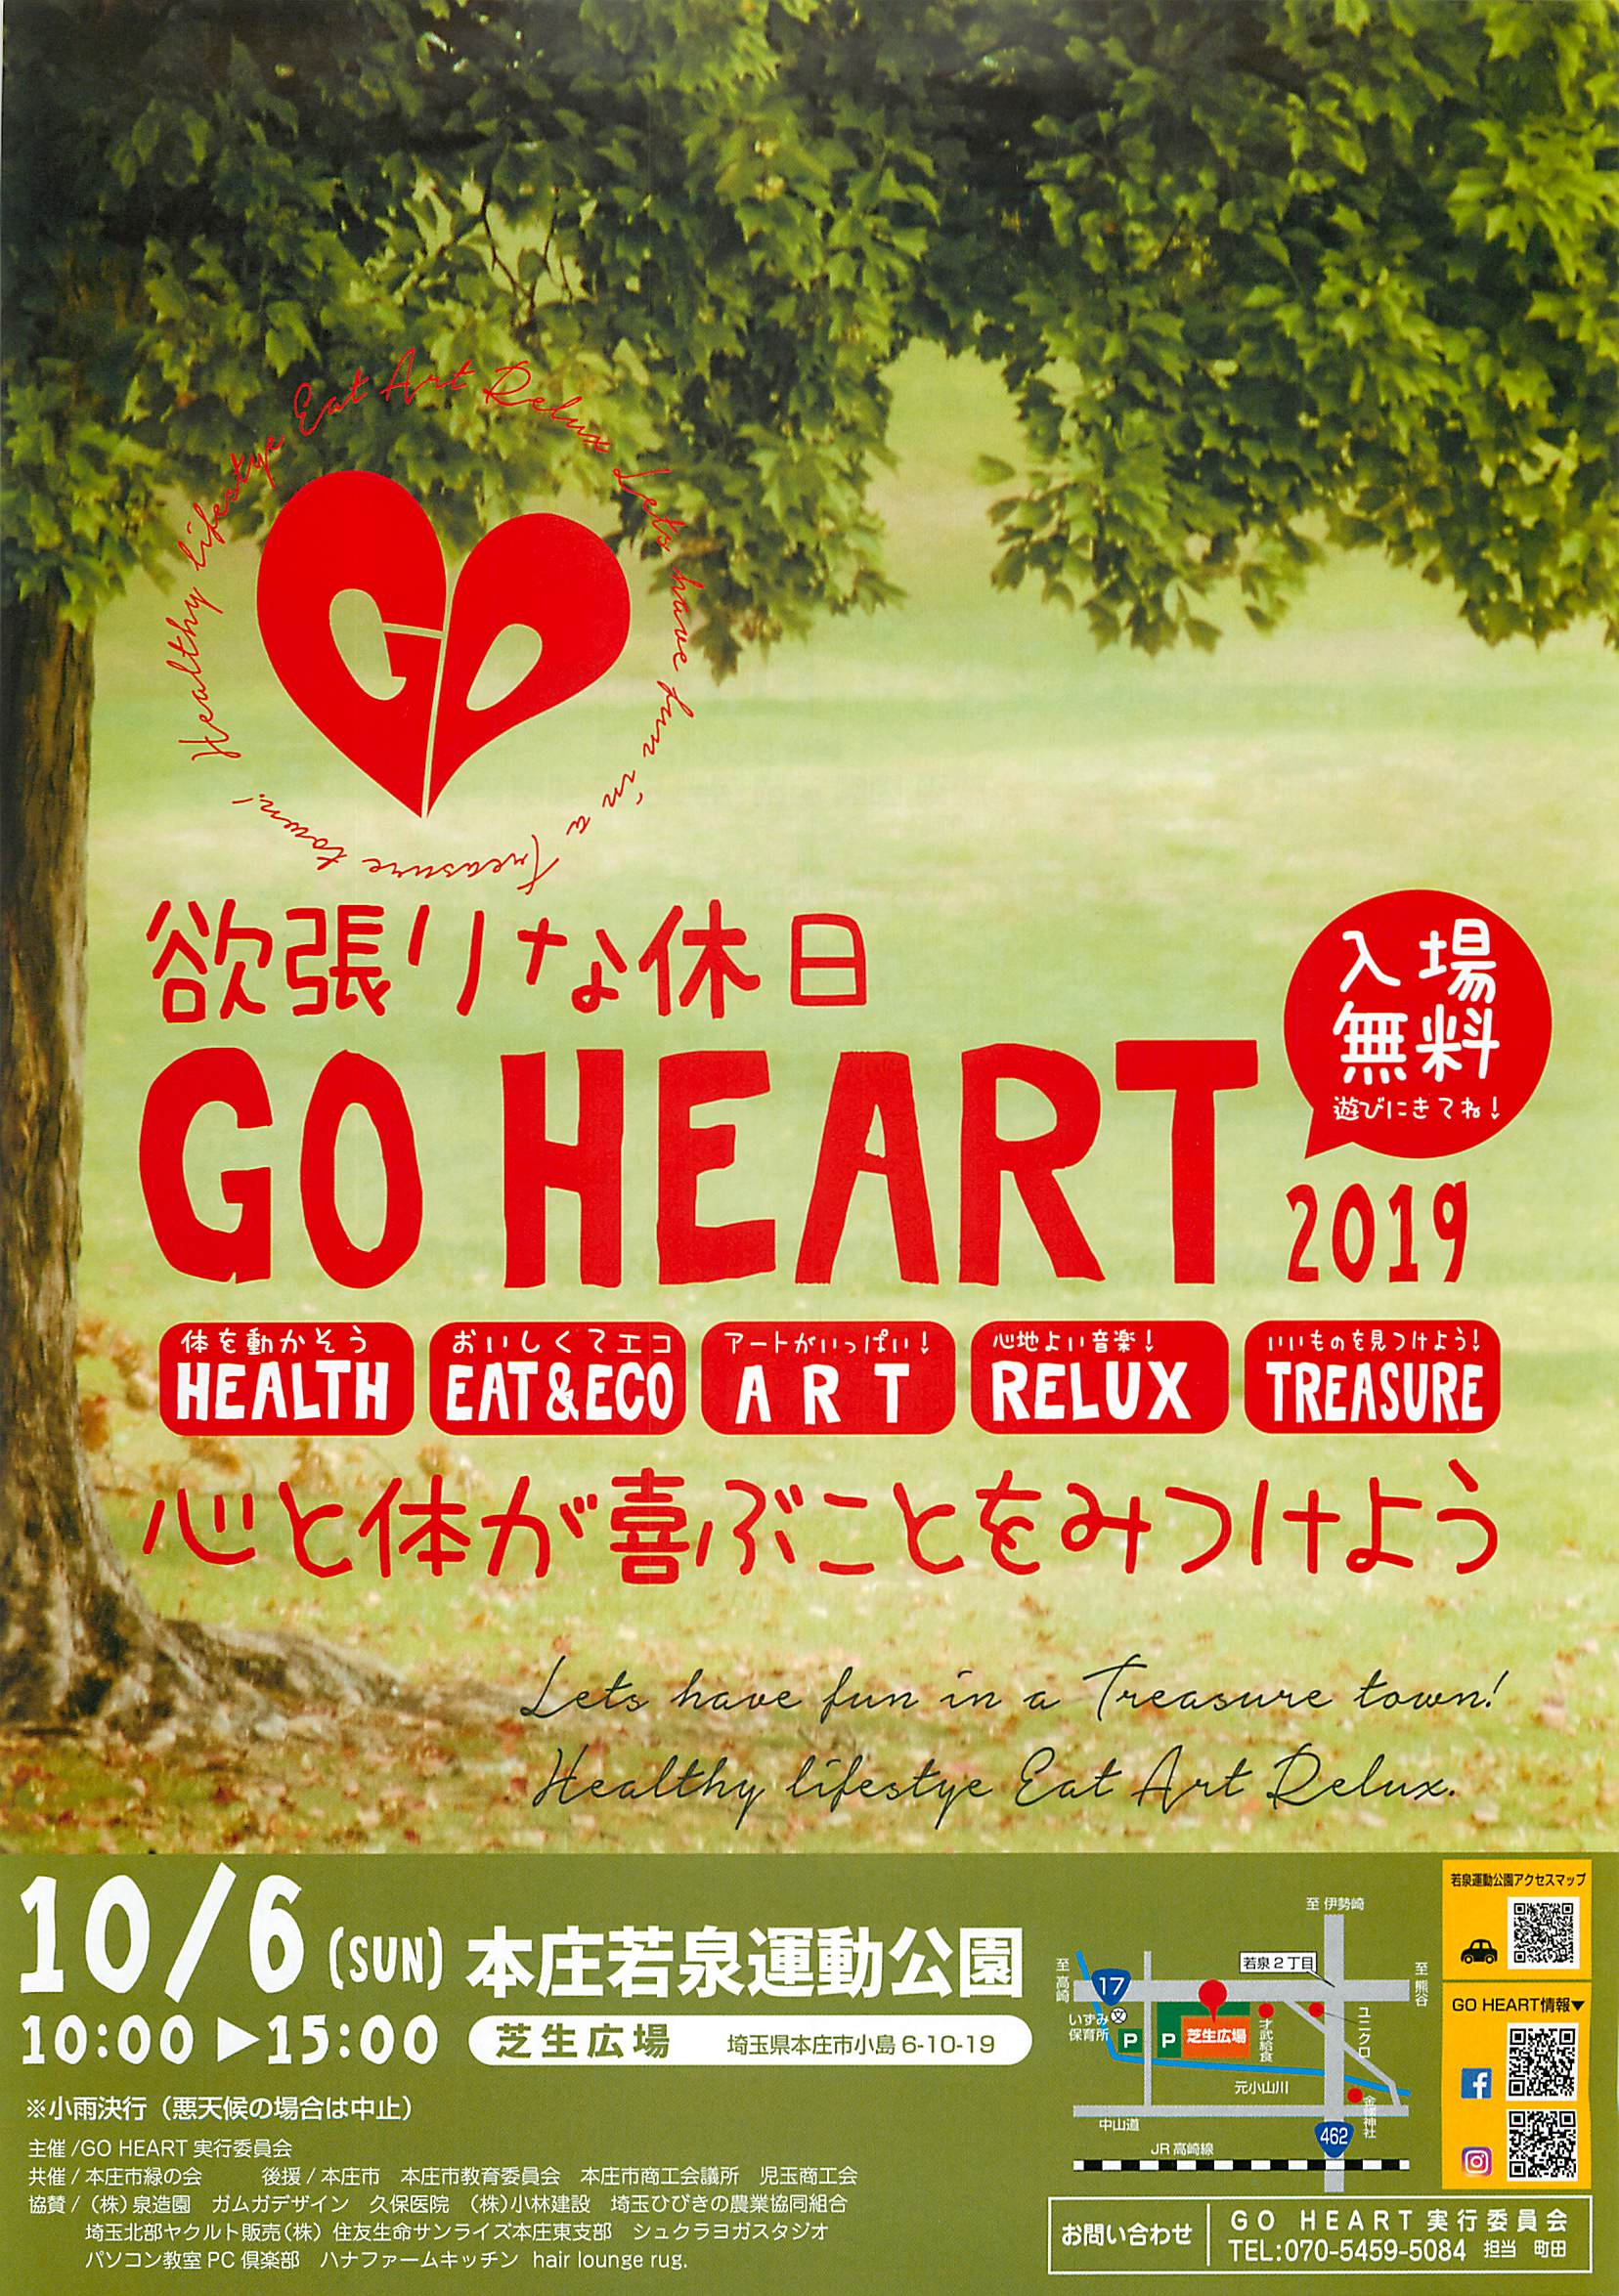 GO HEART 2019 omote